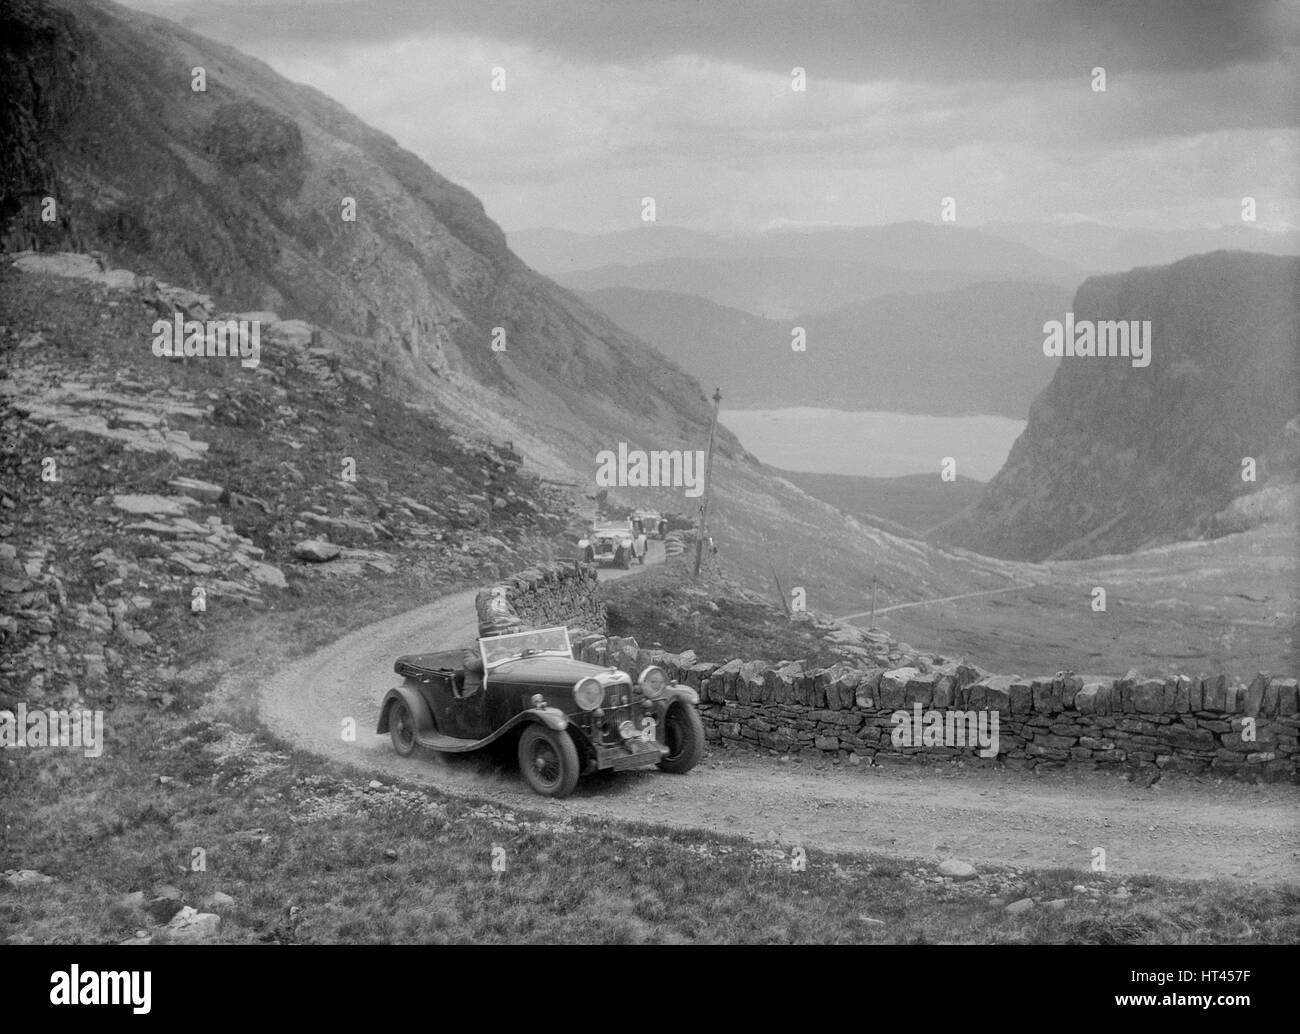 Lagonda competing in the RSAC Scottish Rally, 1936. Artist: Bill Brunell. - Stock Image